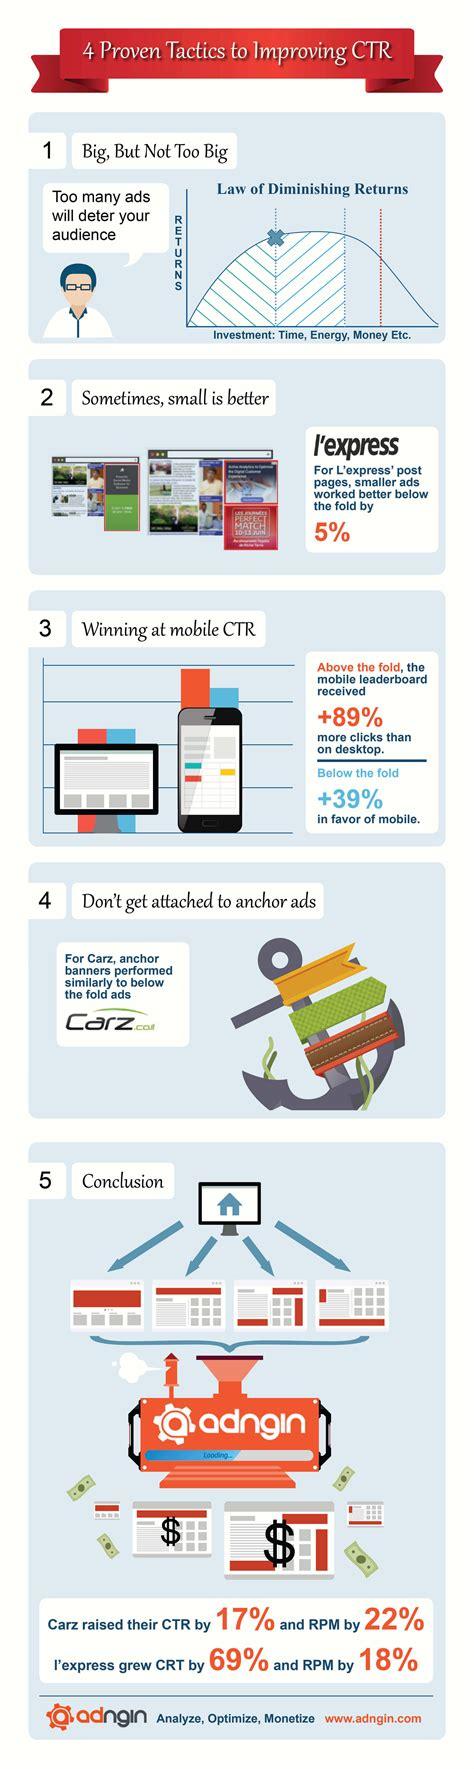 adsense express infographic the secrets behind successful google adsense